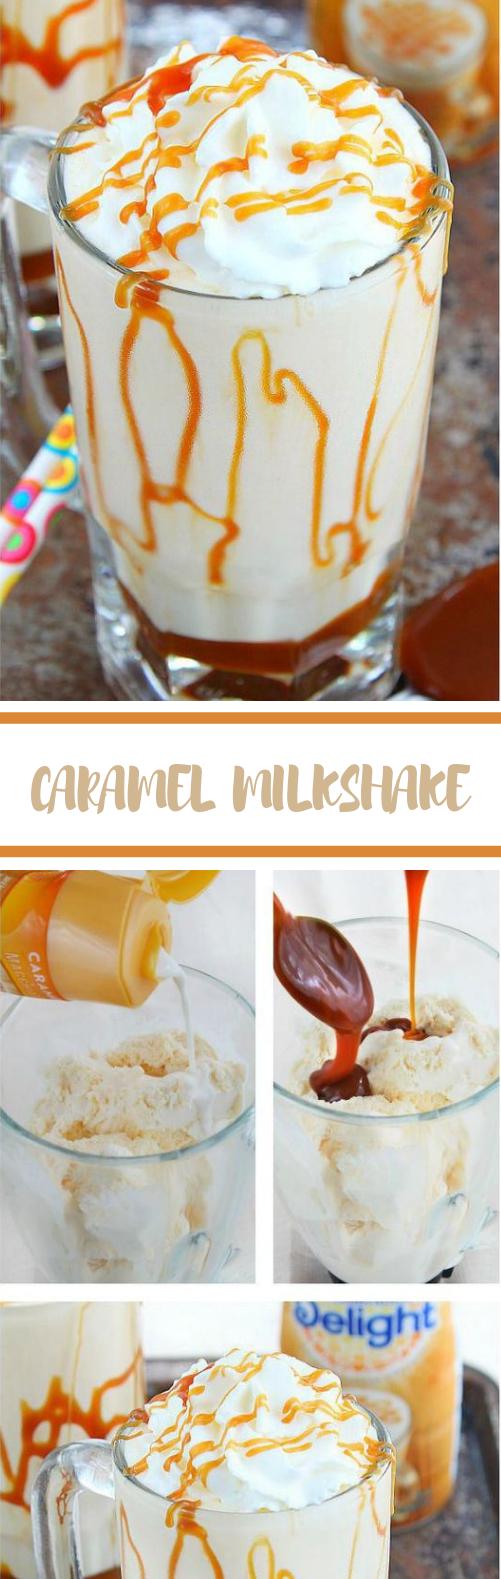 Caramel Milkshake #sweet #drinks